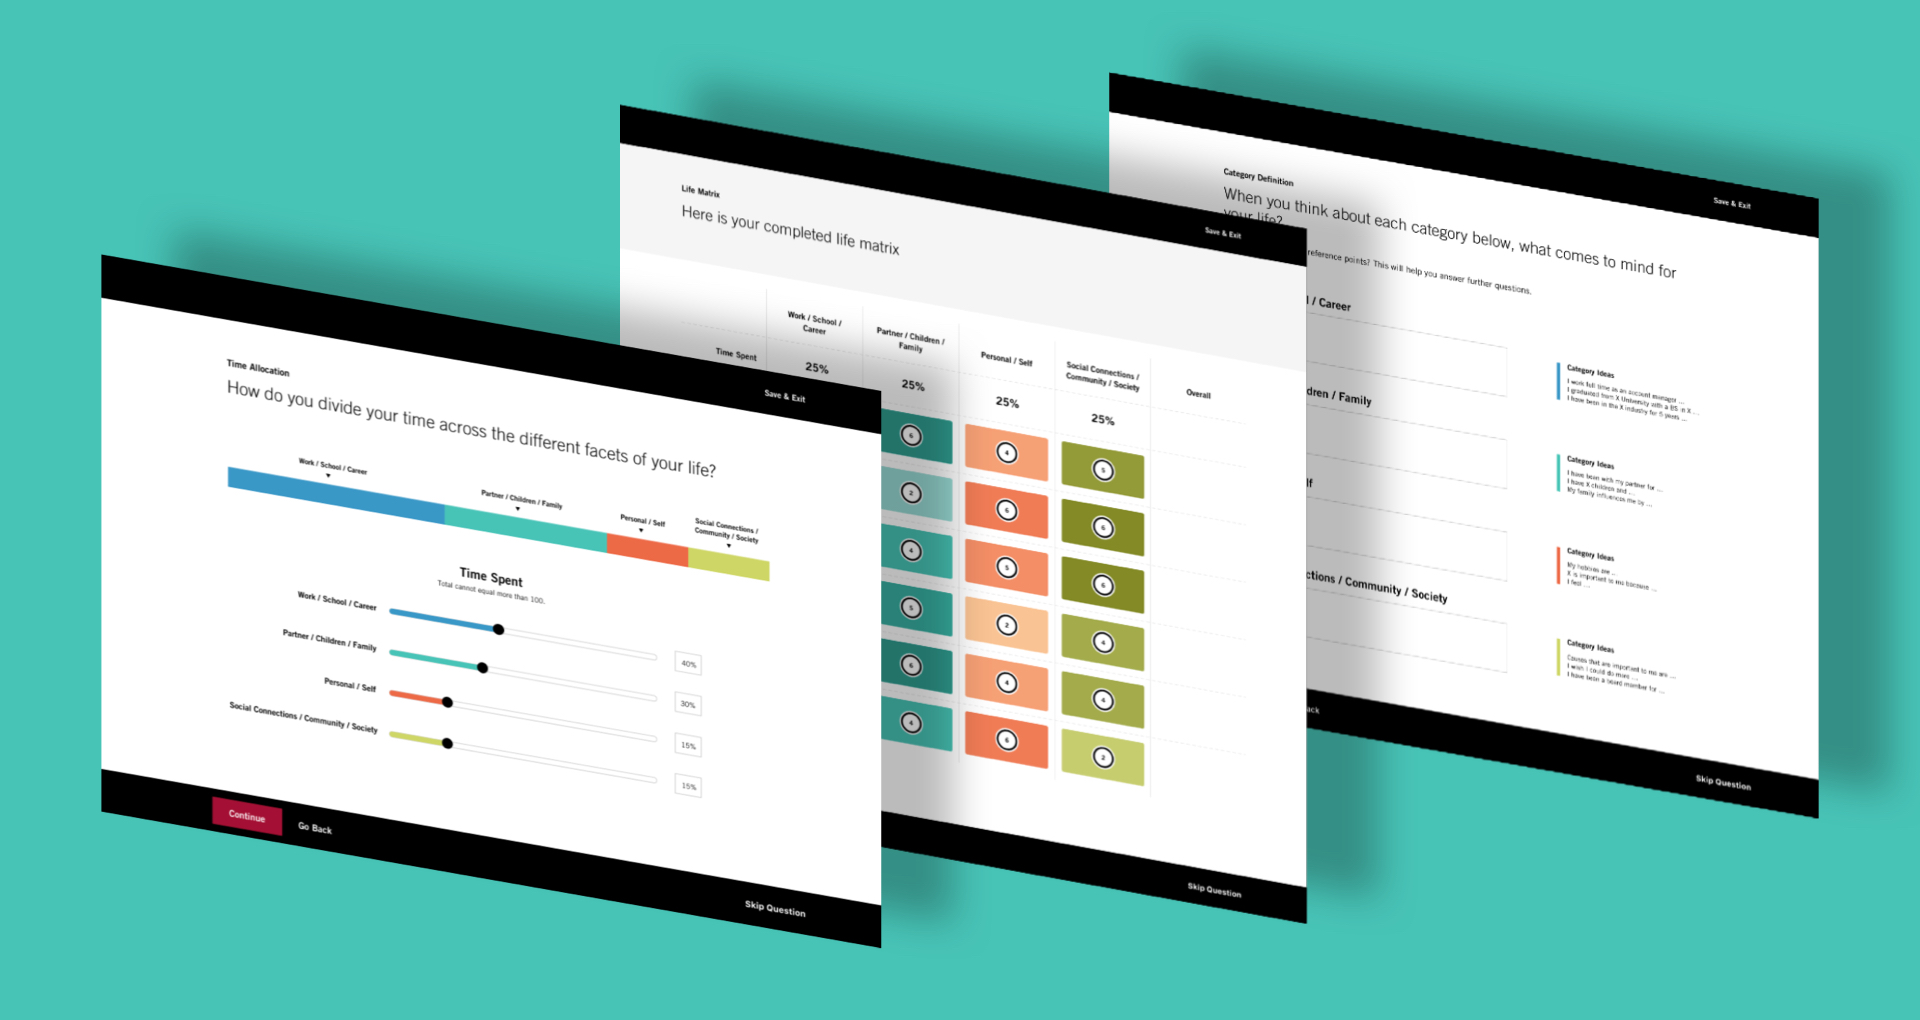 survey tool for ivy league business school